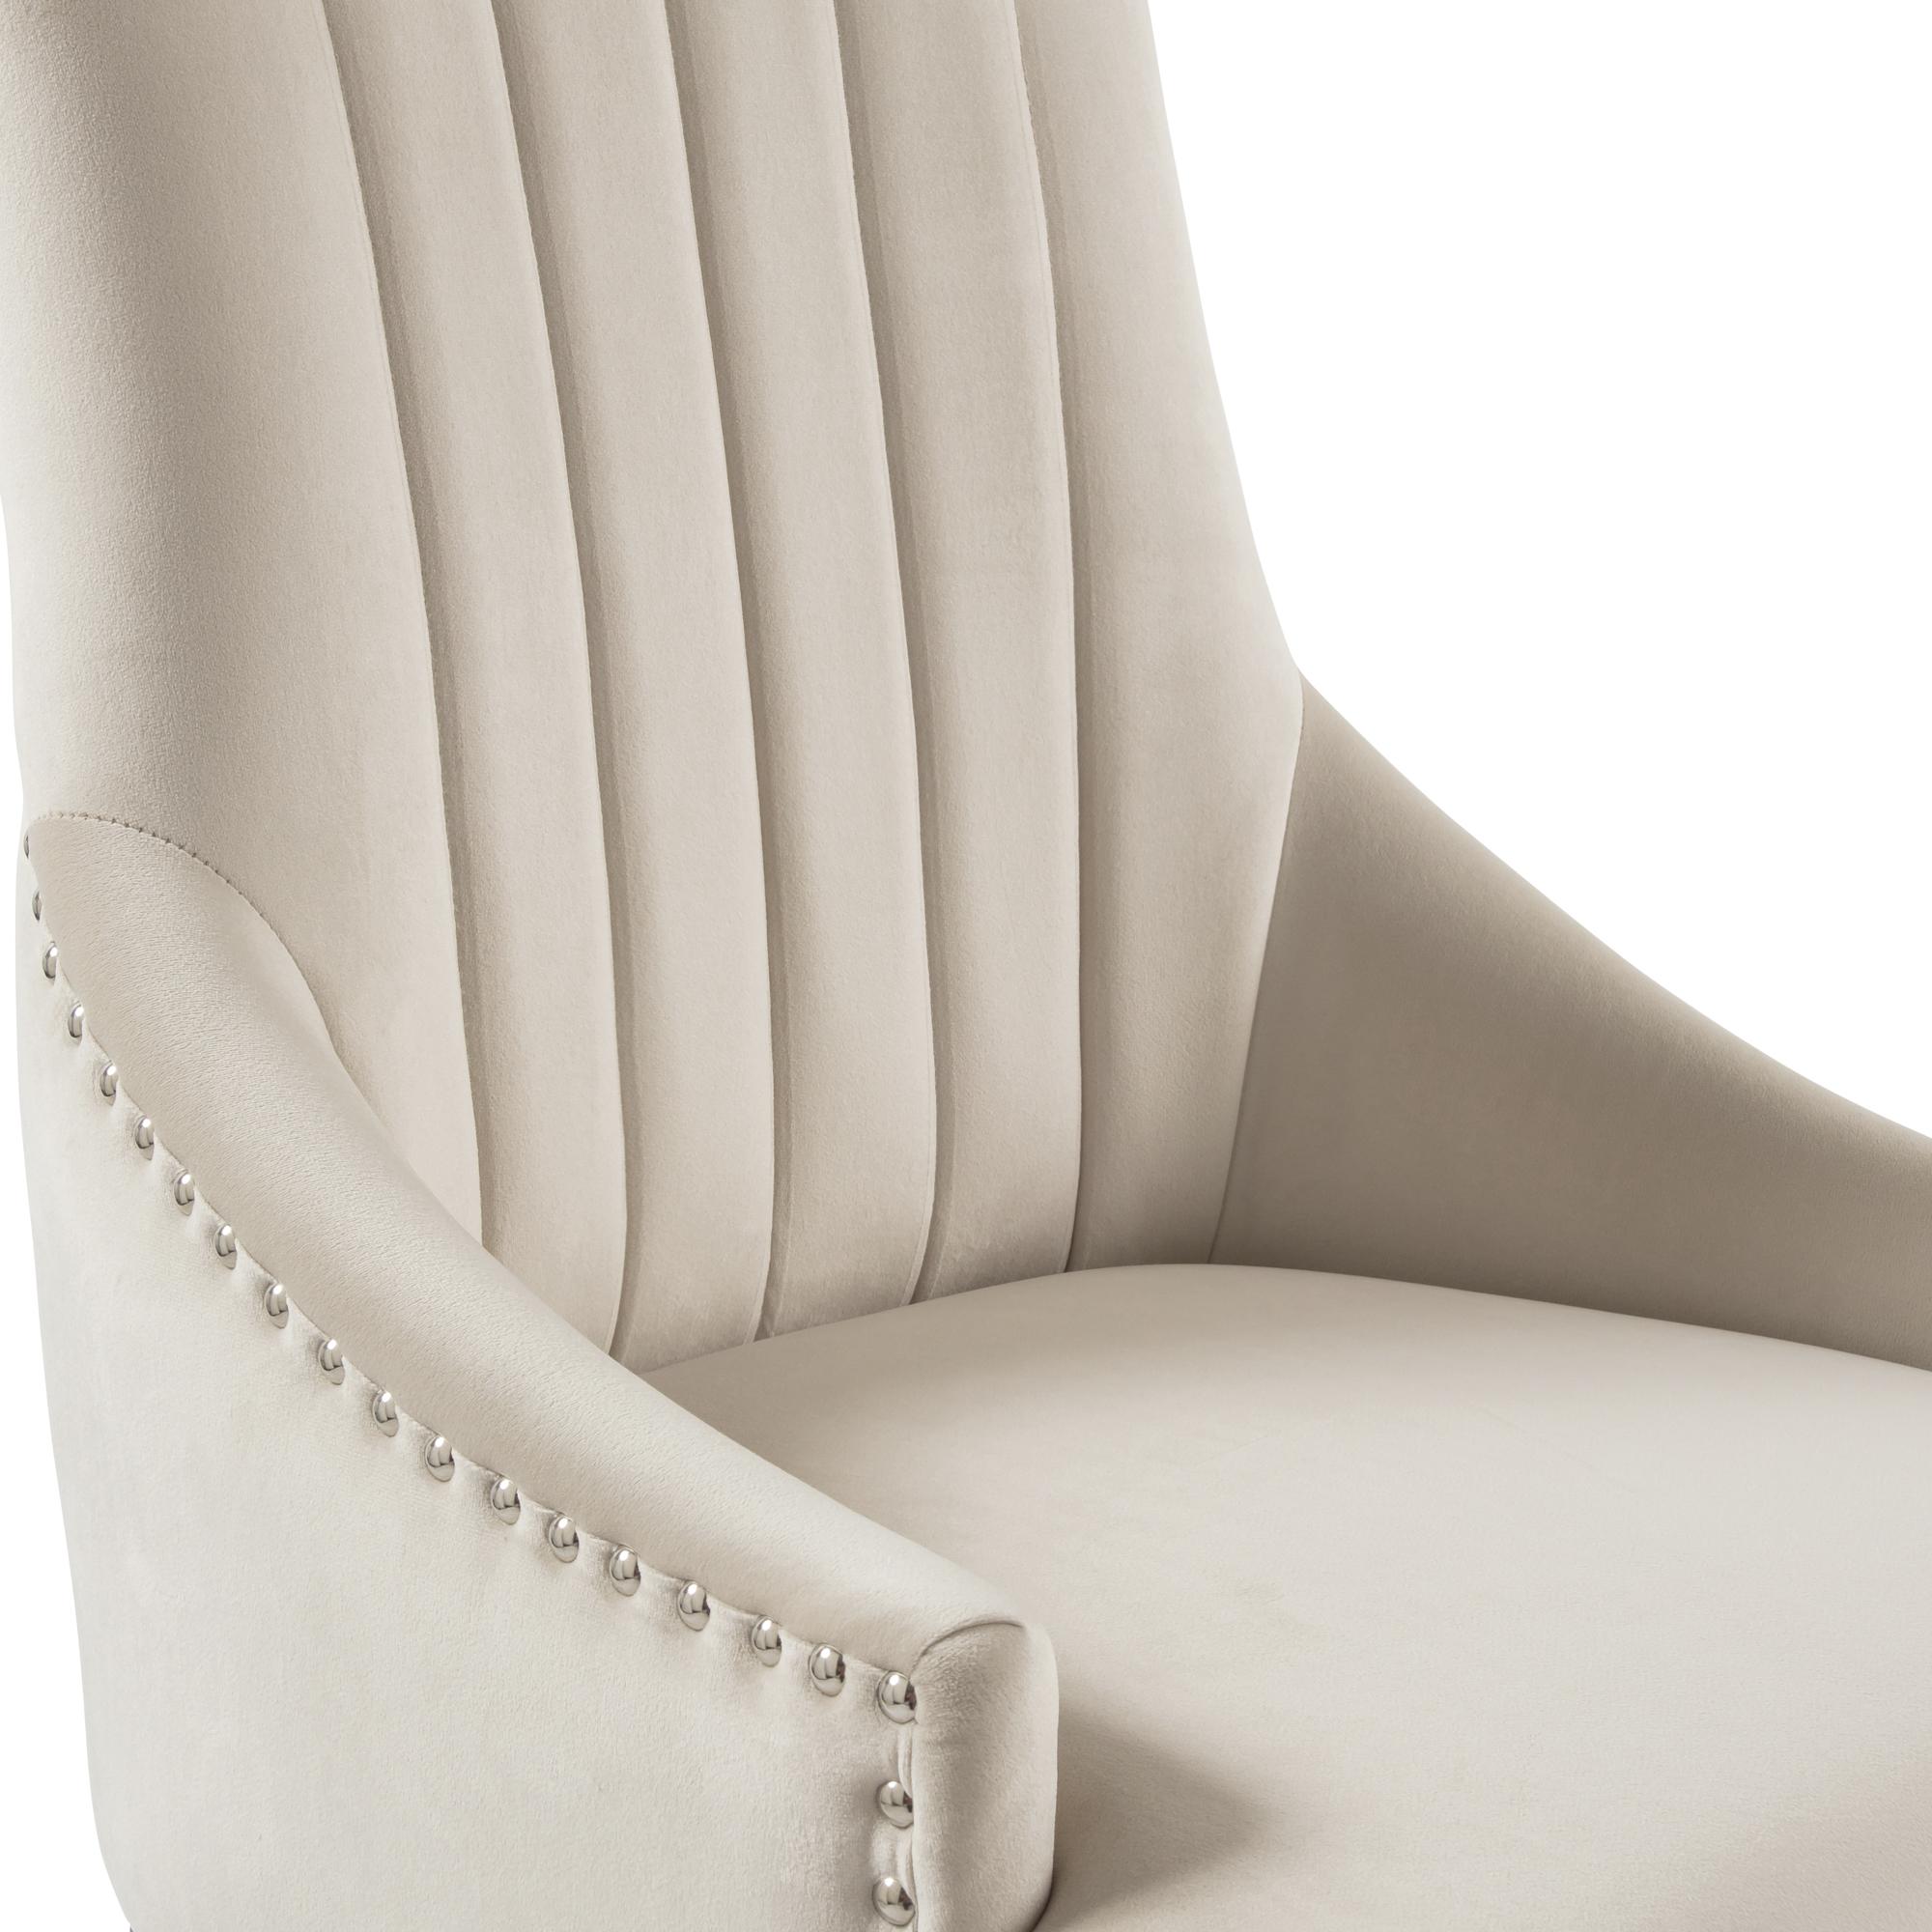 Chelsea Cream Brushed Velvet Upholstered Scoop Dining Chair – White Washed Legs